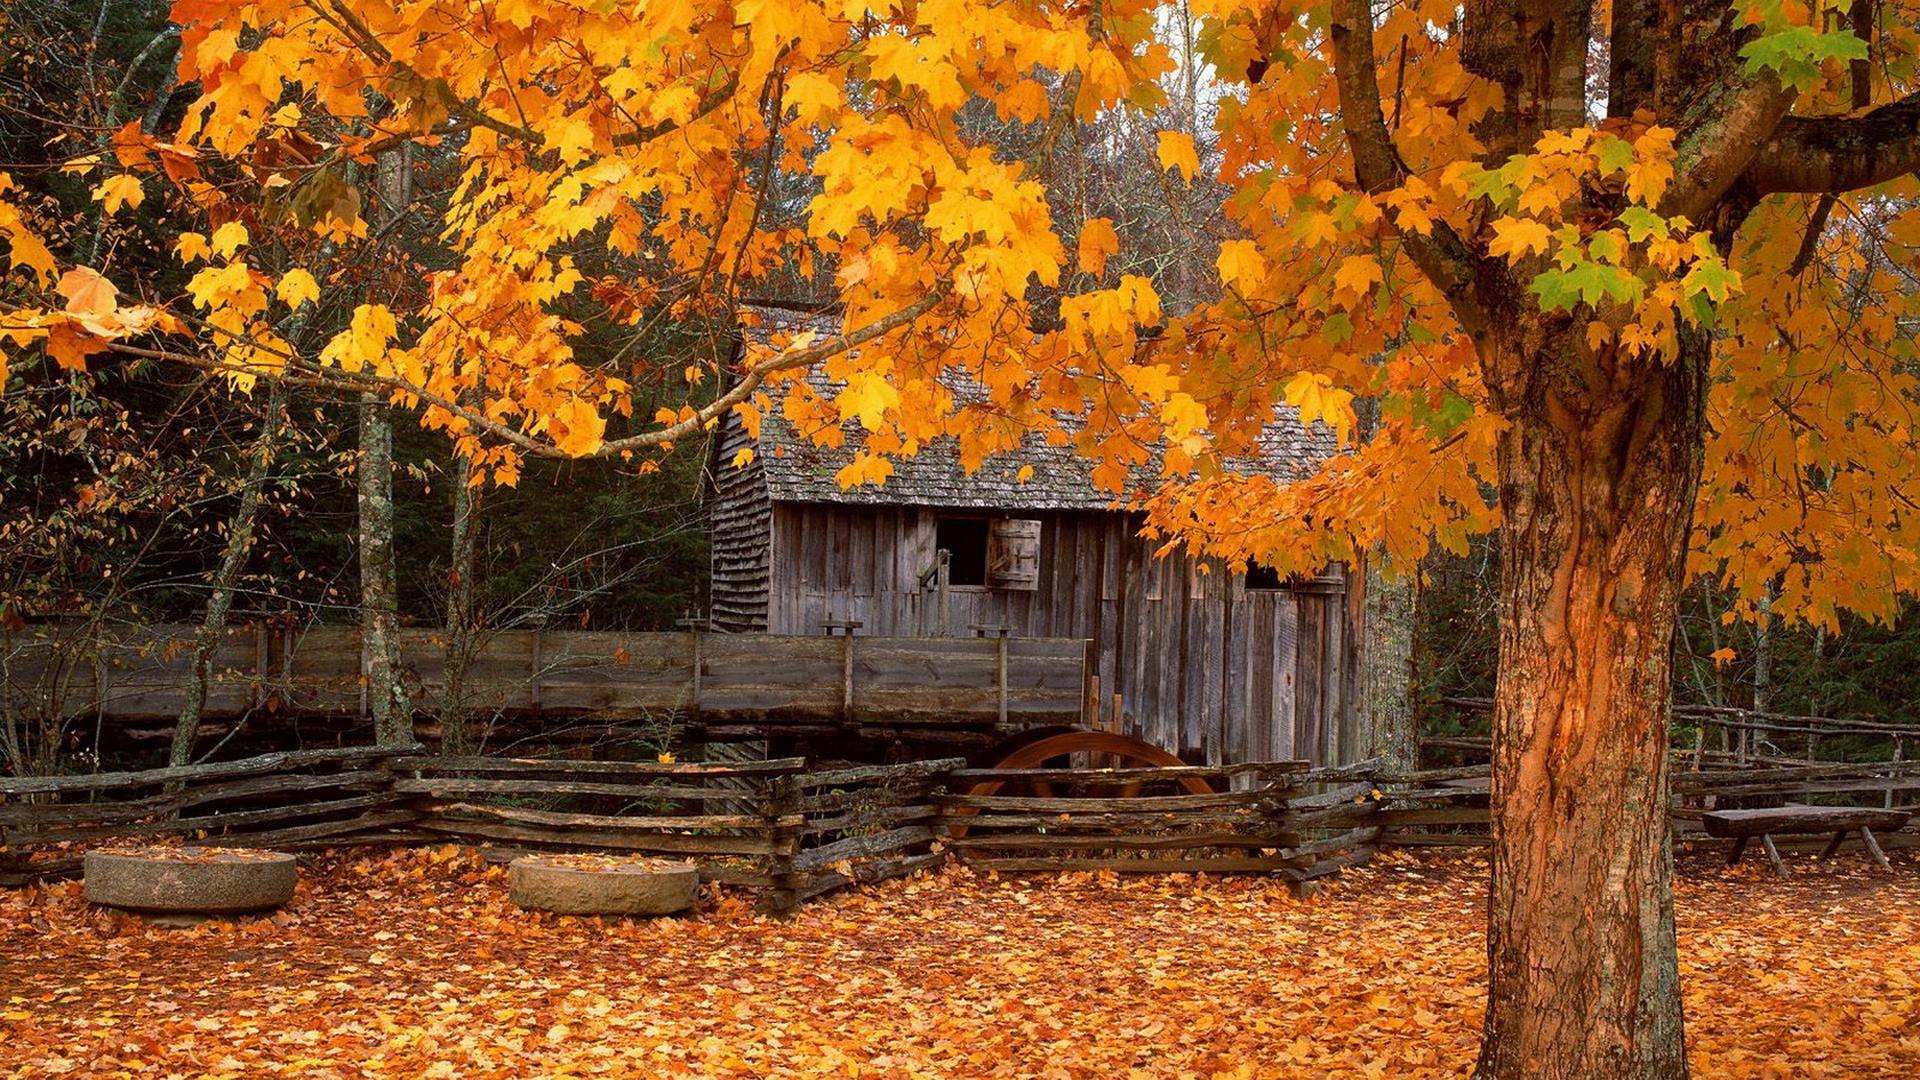 Autumn Cabin Wallpaper 1920x1080 Autumn Cabindownloads 1920x1080